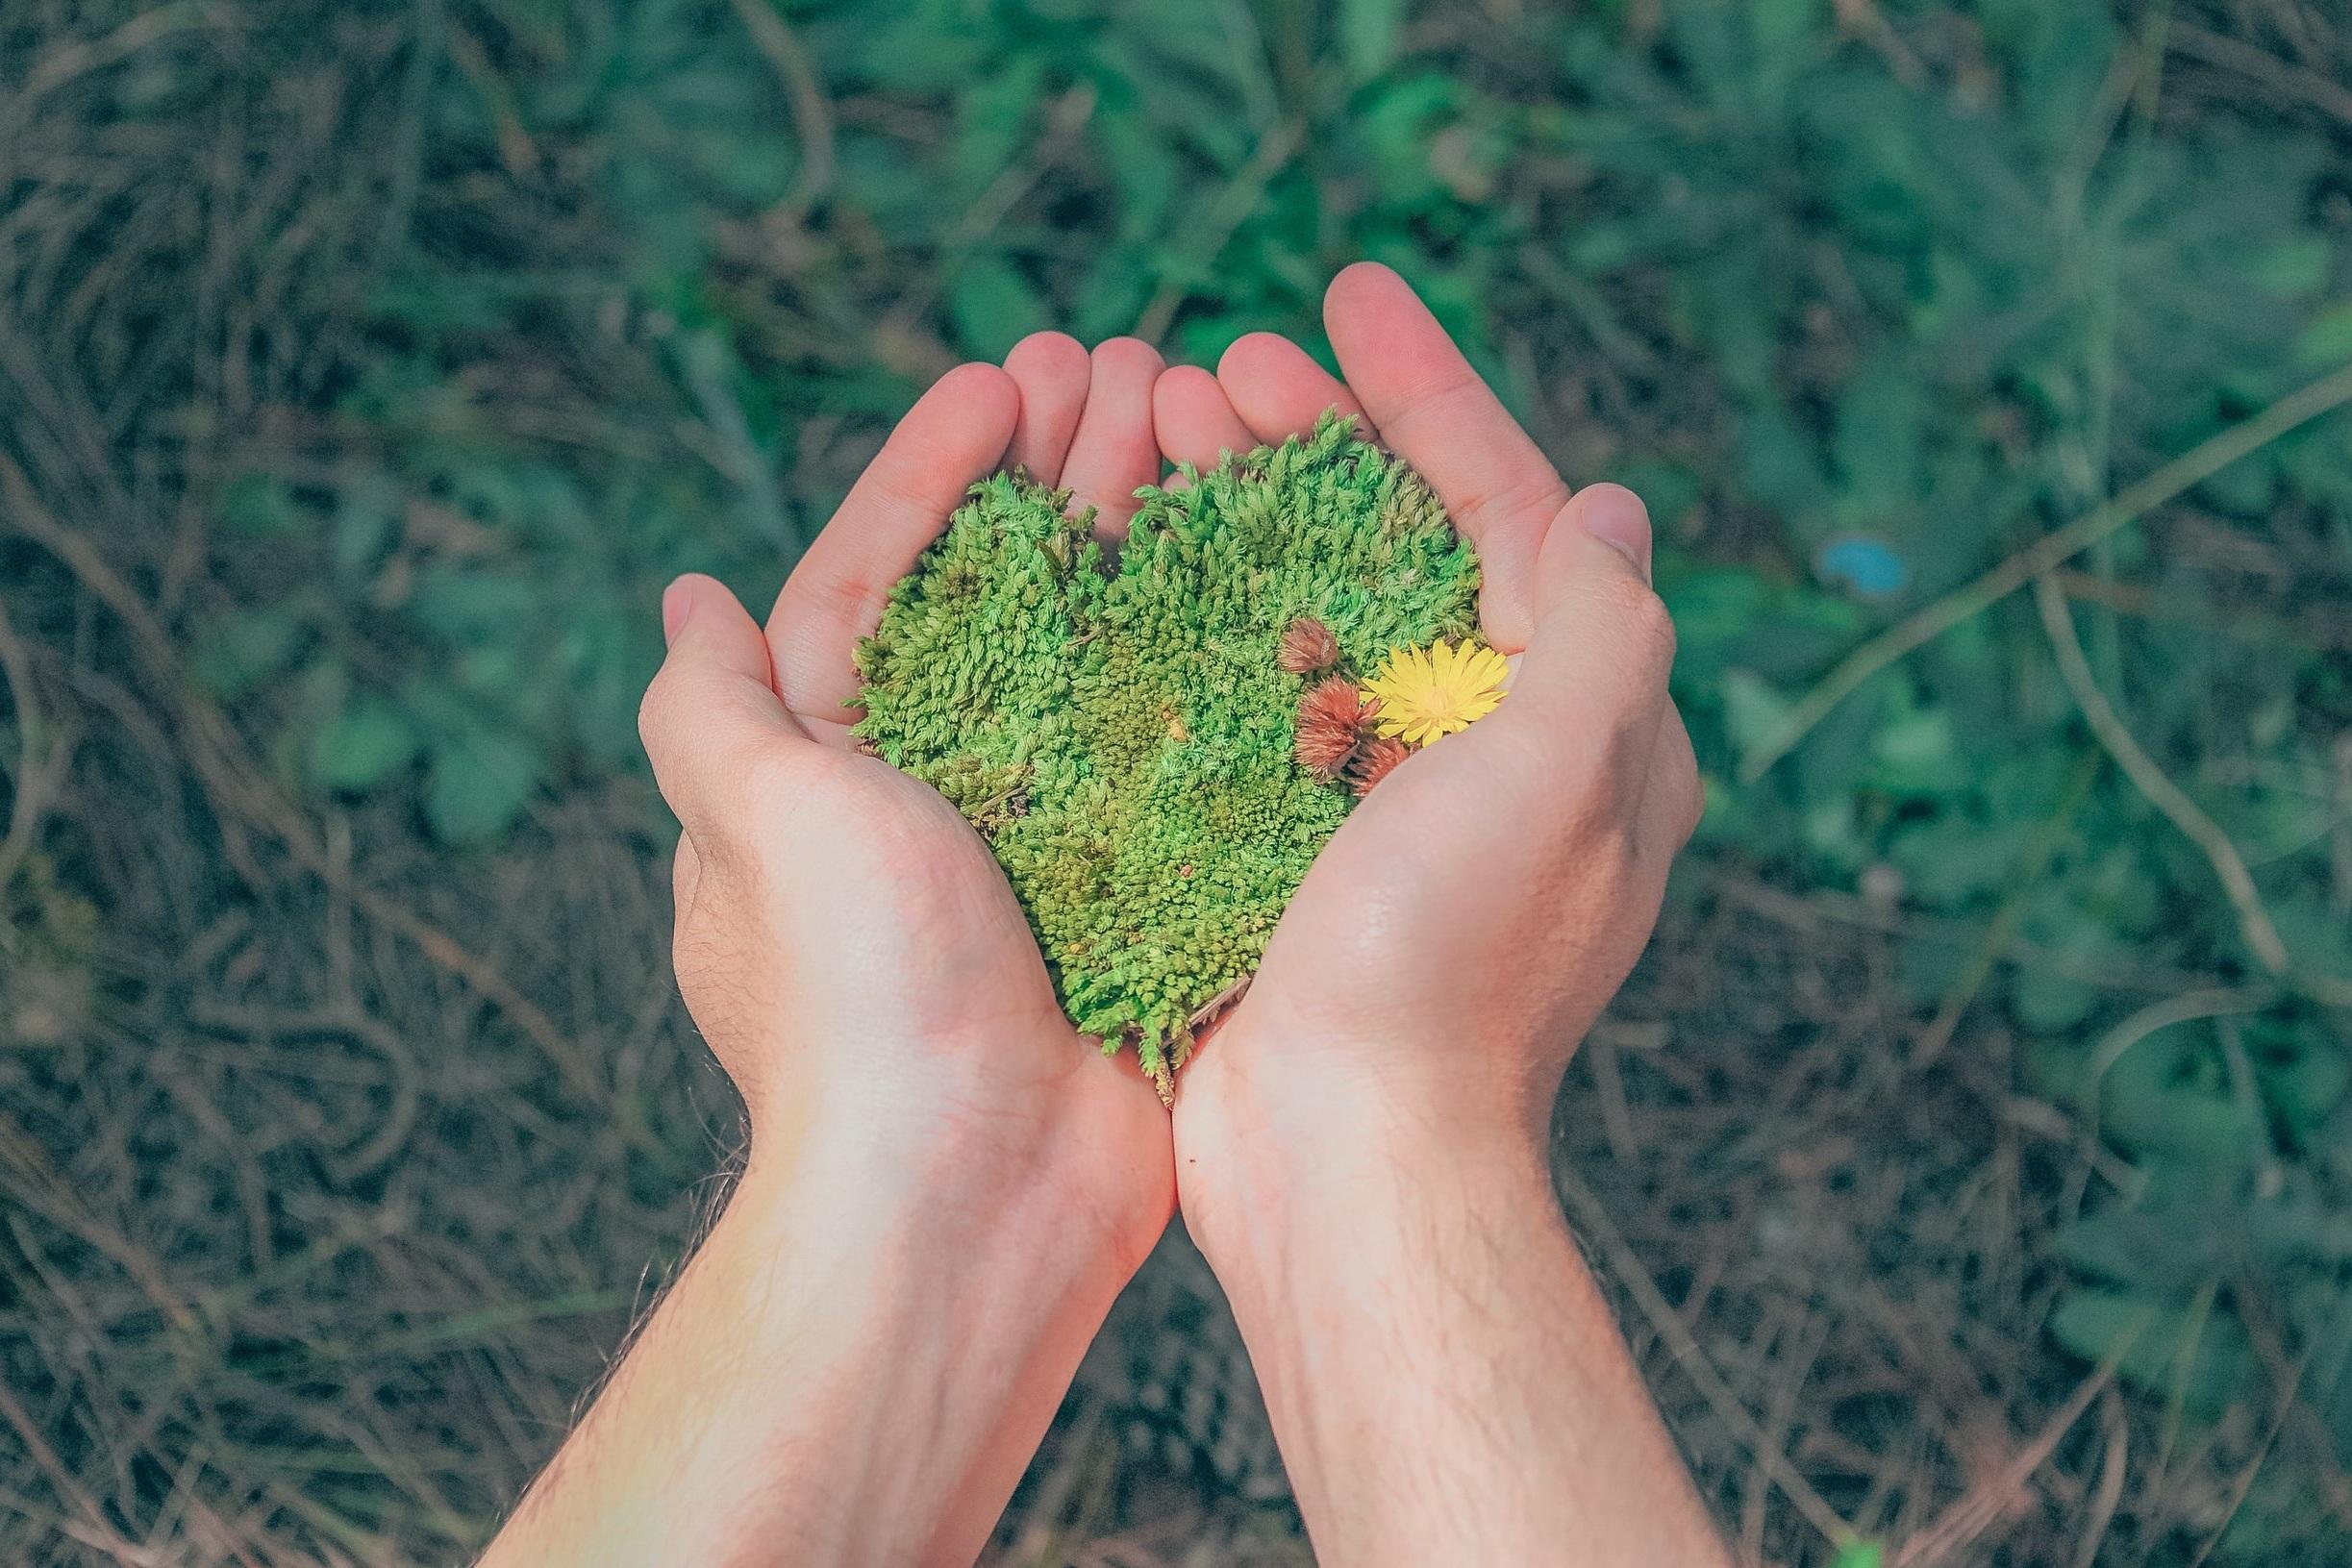 daylight-environment-flora-1230157.jpg